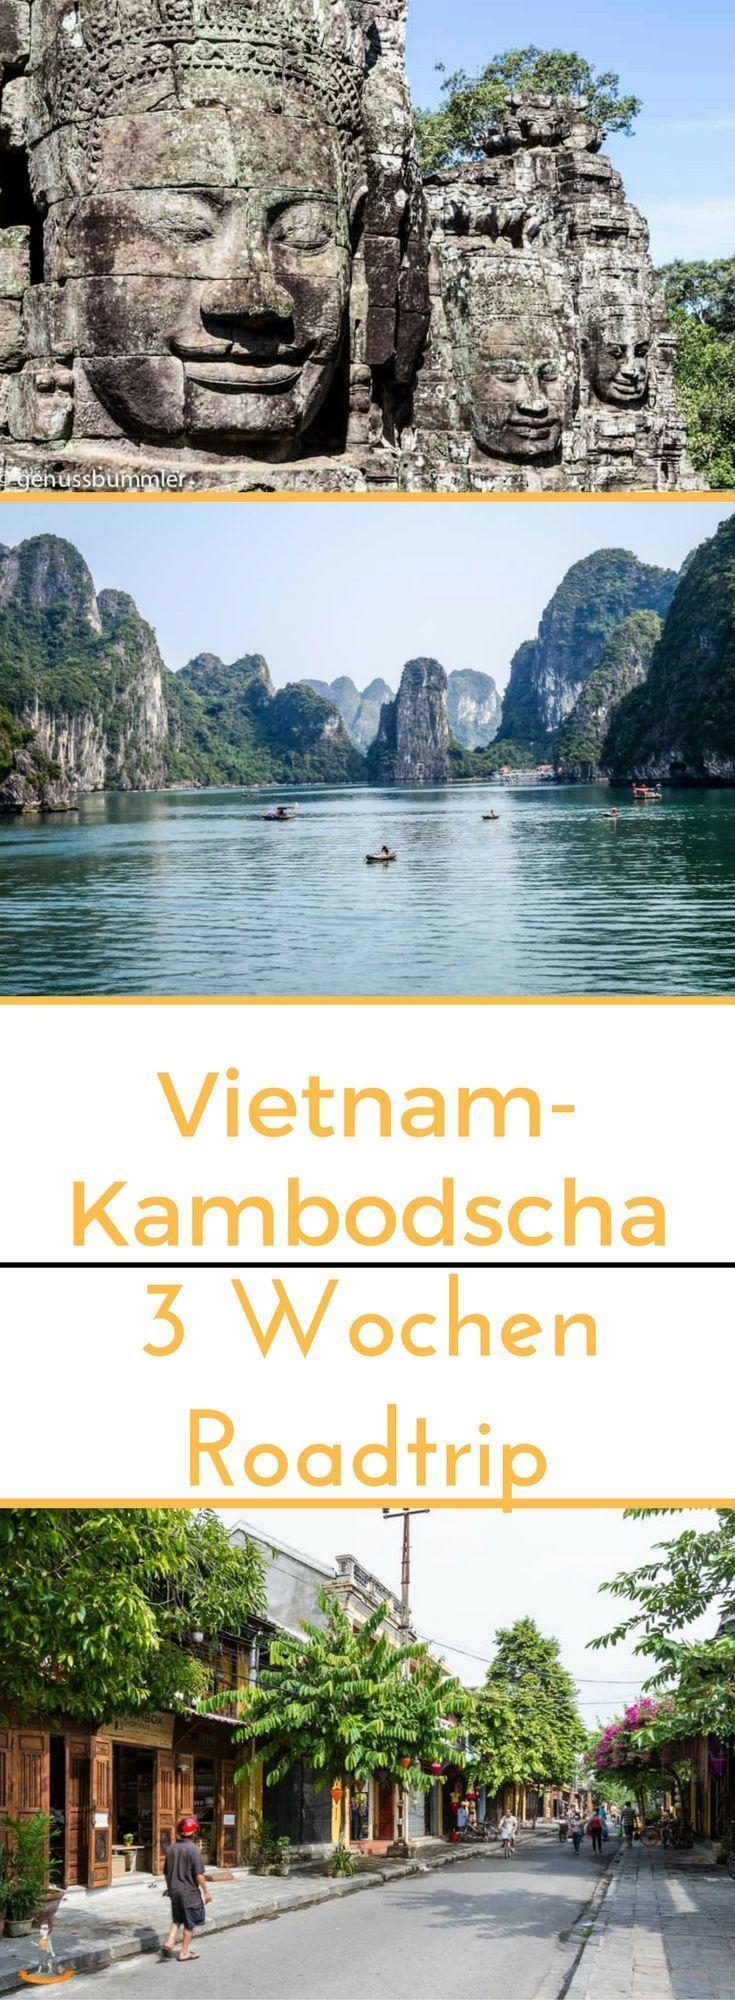 Vietnam Tour and Cambodia #travel Roadtrip 6: Vietnam-Cambodia ... -  Round trip through Vietnam and some Cambodia #travel Road trip 6: Vietnam-Cambodia  - #AsiaTravel #cambodia #Ireland #NightlifeTravel #roadtrip #ShoppingTravel #tour #travel #vietnam #VietnamCambodia